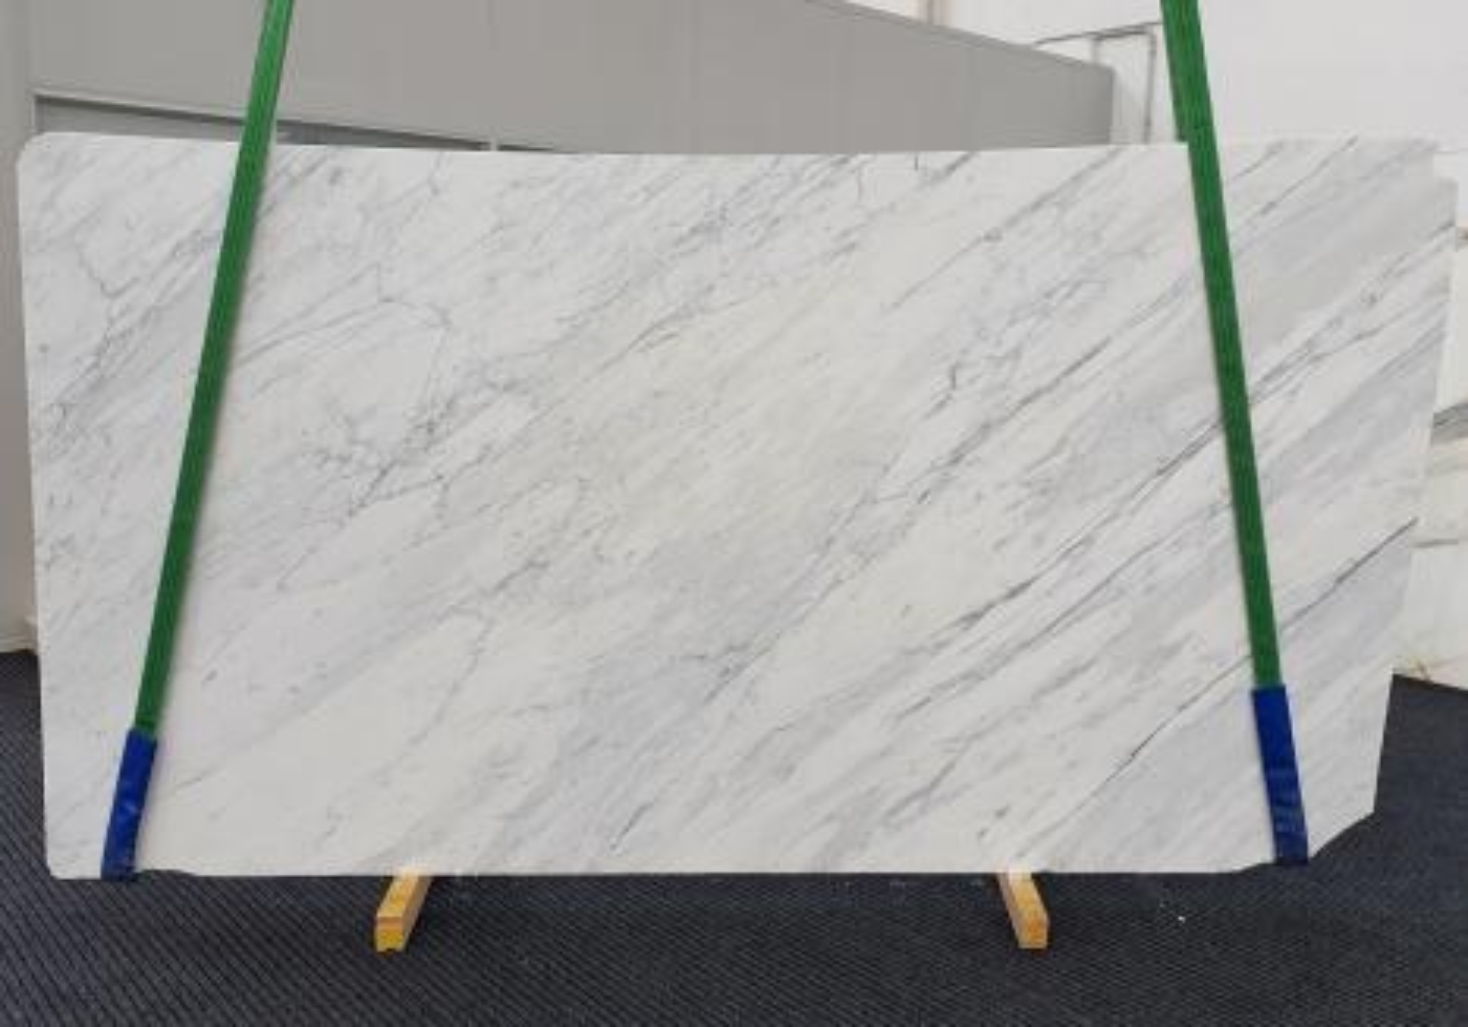 CALACATTA CARRARA Supply Veneto (Italy) honed slabs 1313 , Slab #11 natural marble